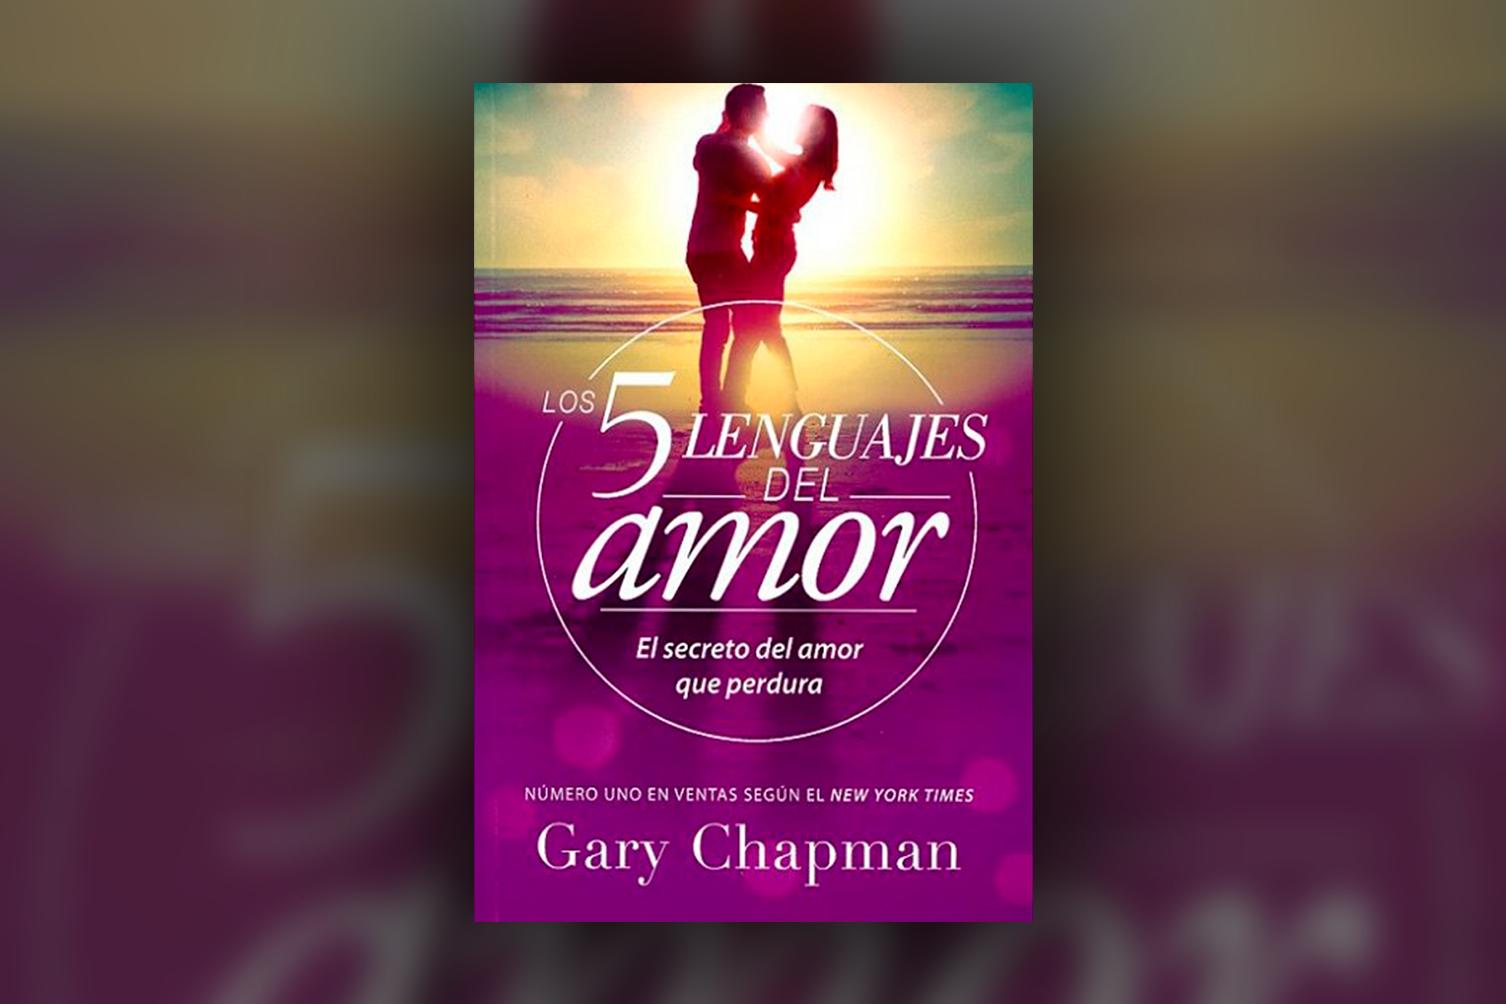 LOS 5 LENGUAJES DEL AMOR – GARY CHAPMAN